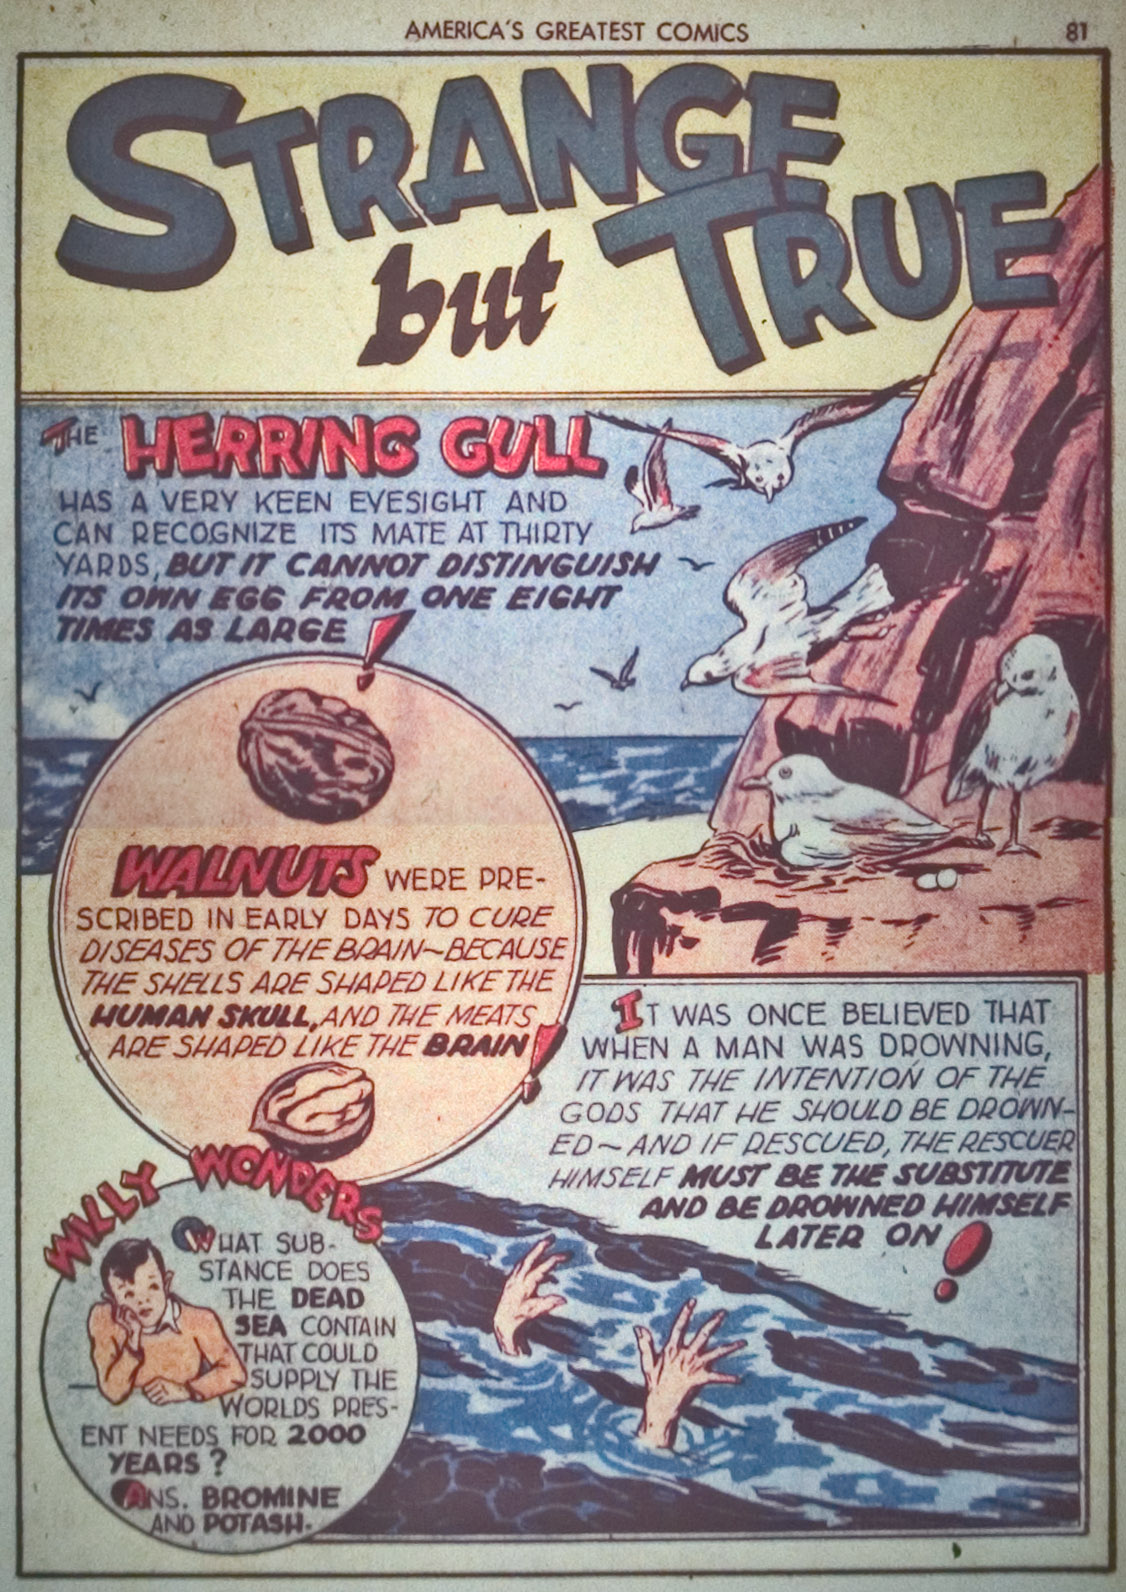 Read online America's Greatest Comics comic -  Issue #1 - 84